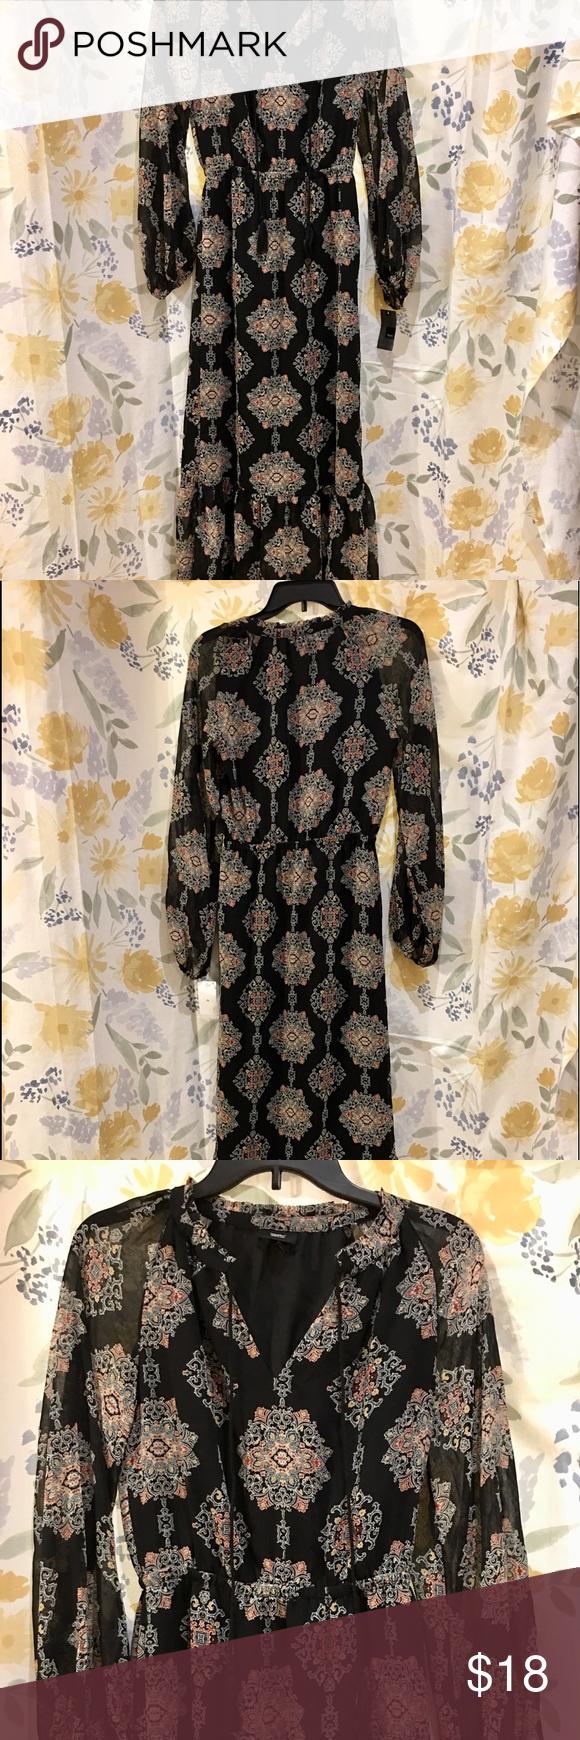 Xhilaration Women S Long Sleeve Maxi Dress Long Sleeve Maxi Dress Dresses Clothes Design [ 1740 x 580 Pixel ]